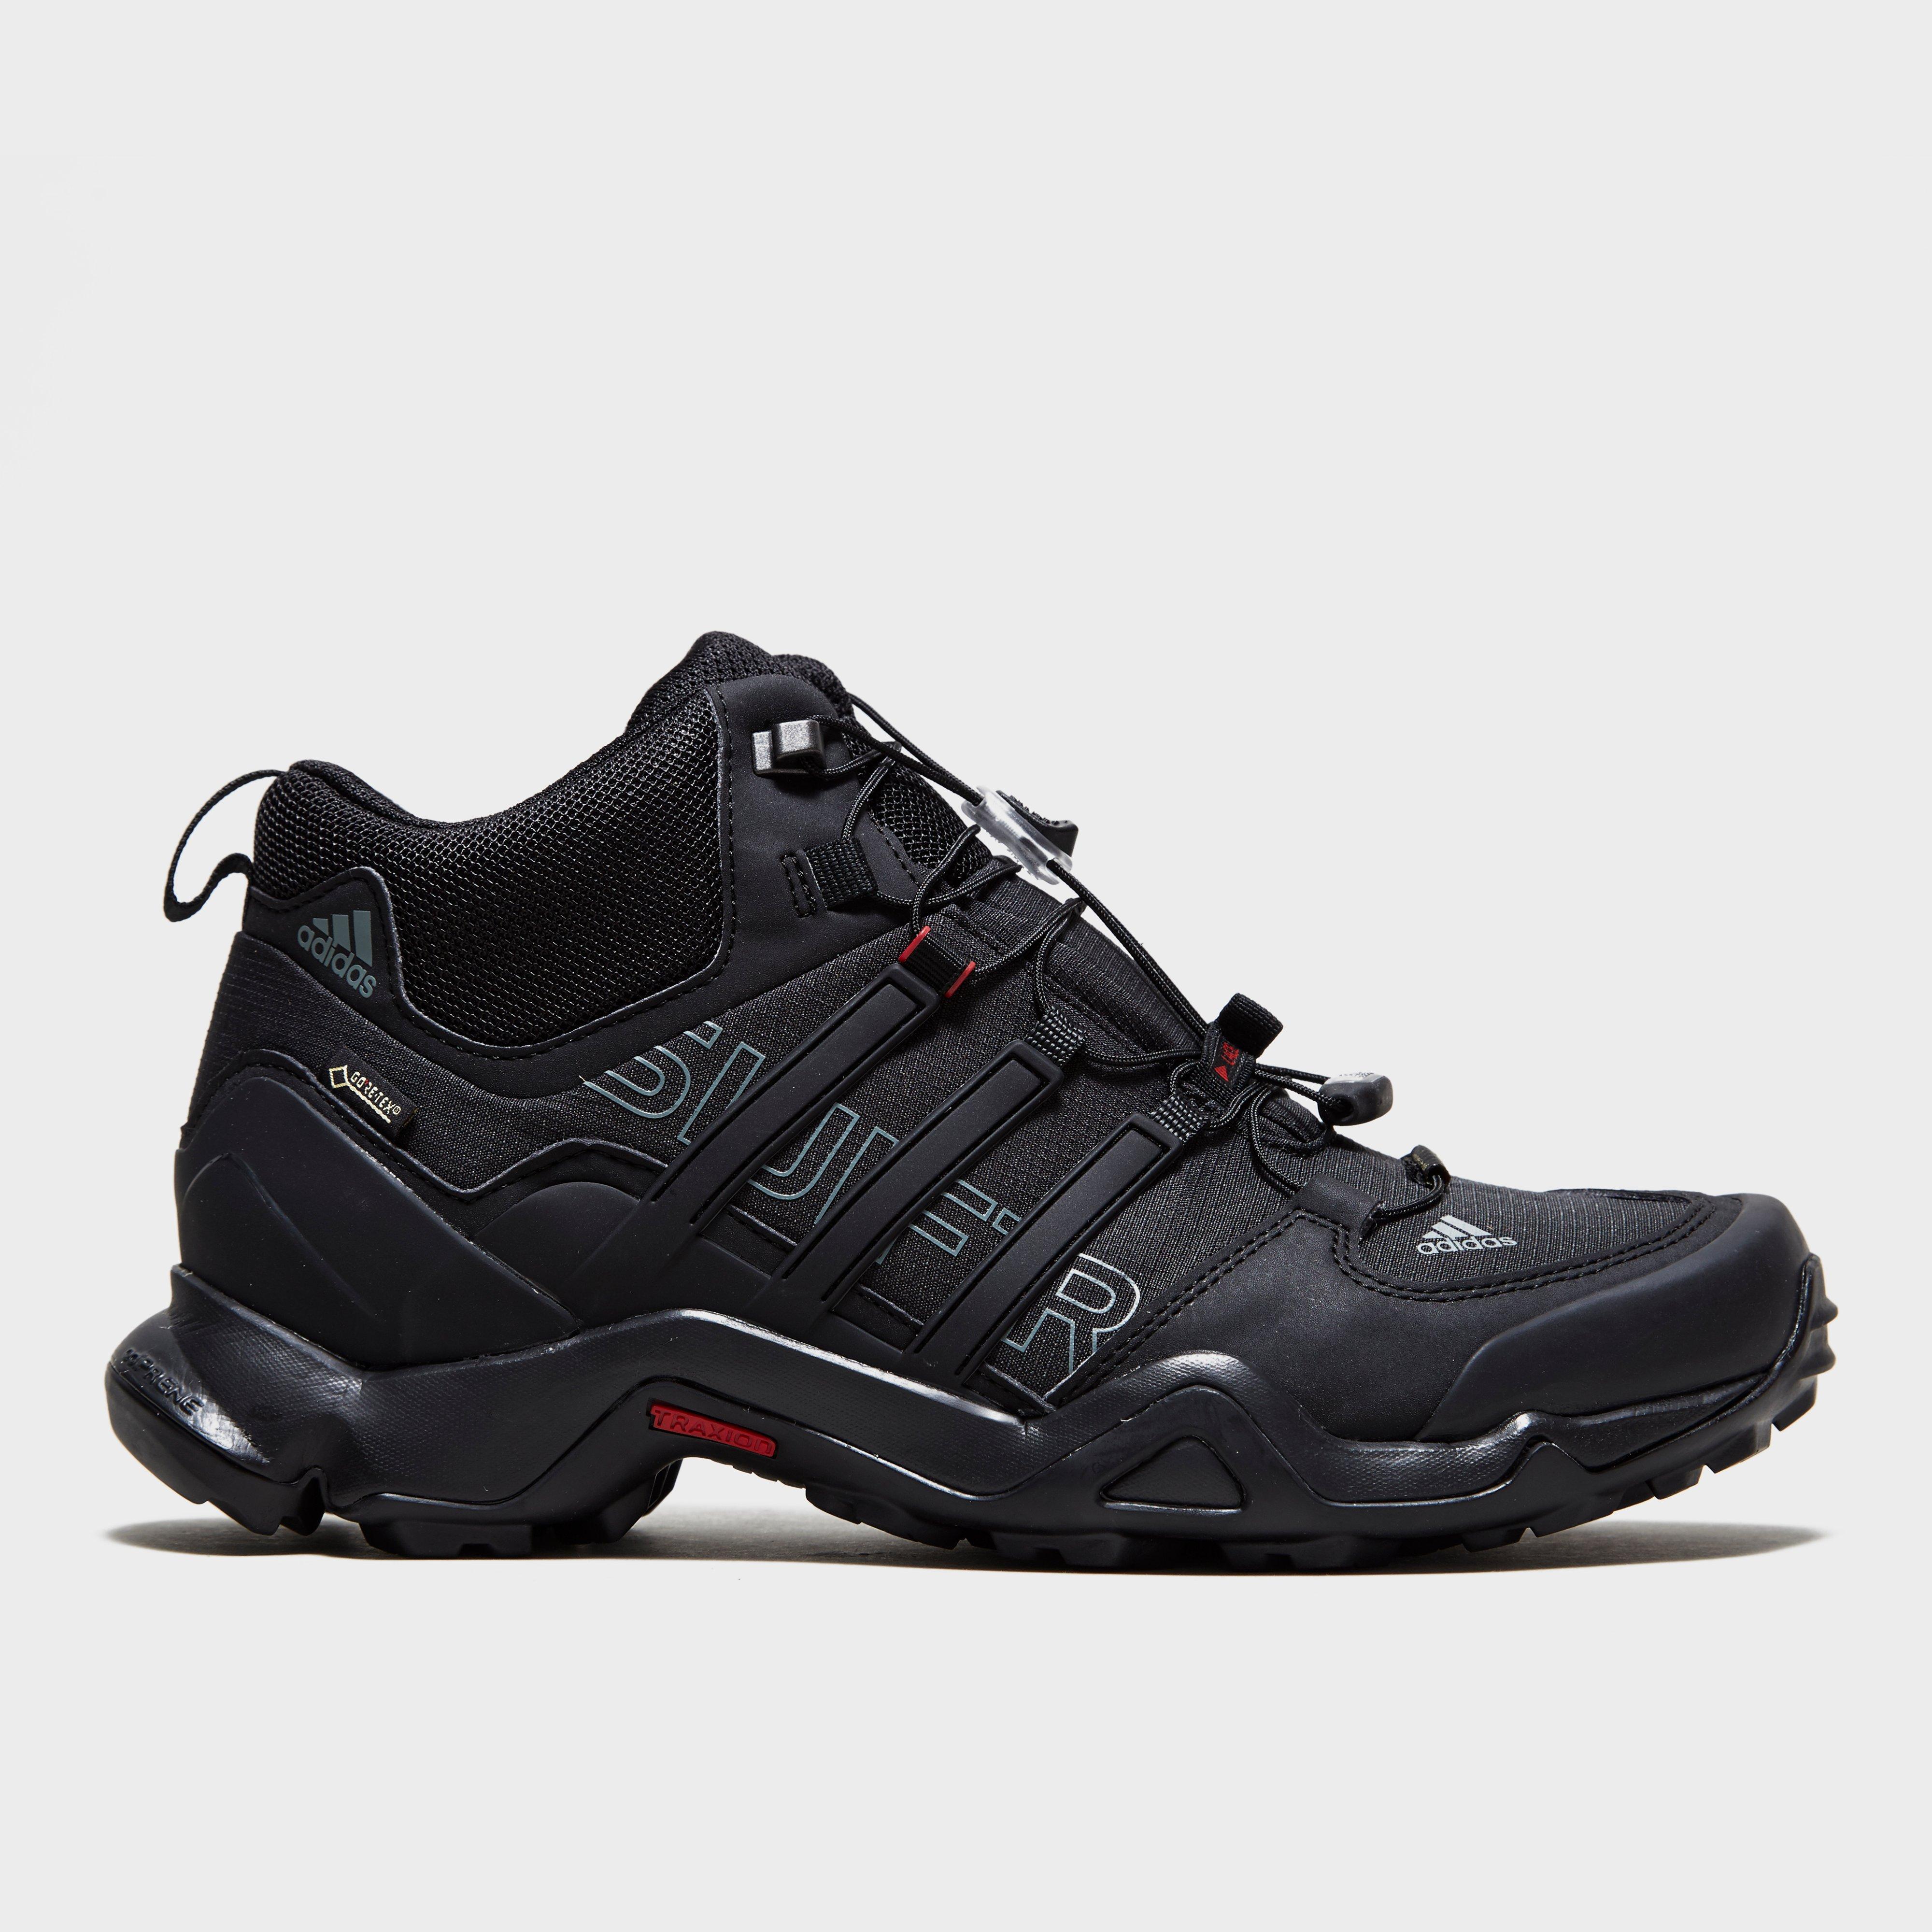 Adidas Mens Terrex Swift R GORETEX Mid Boot Black